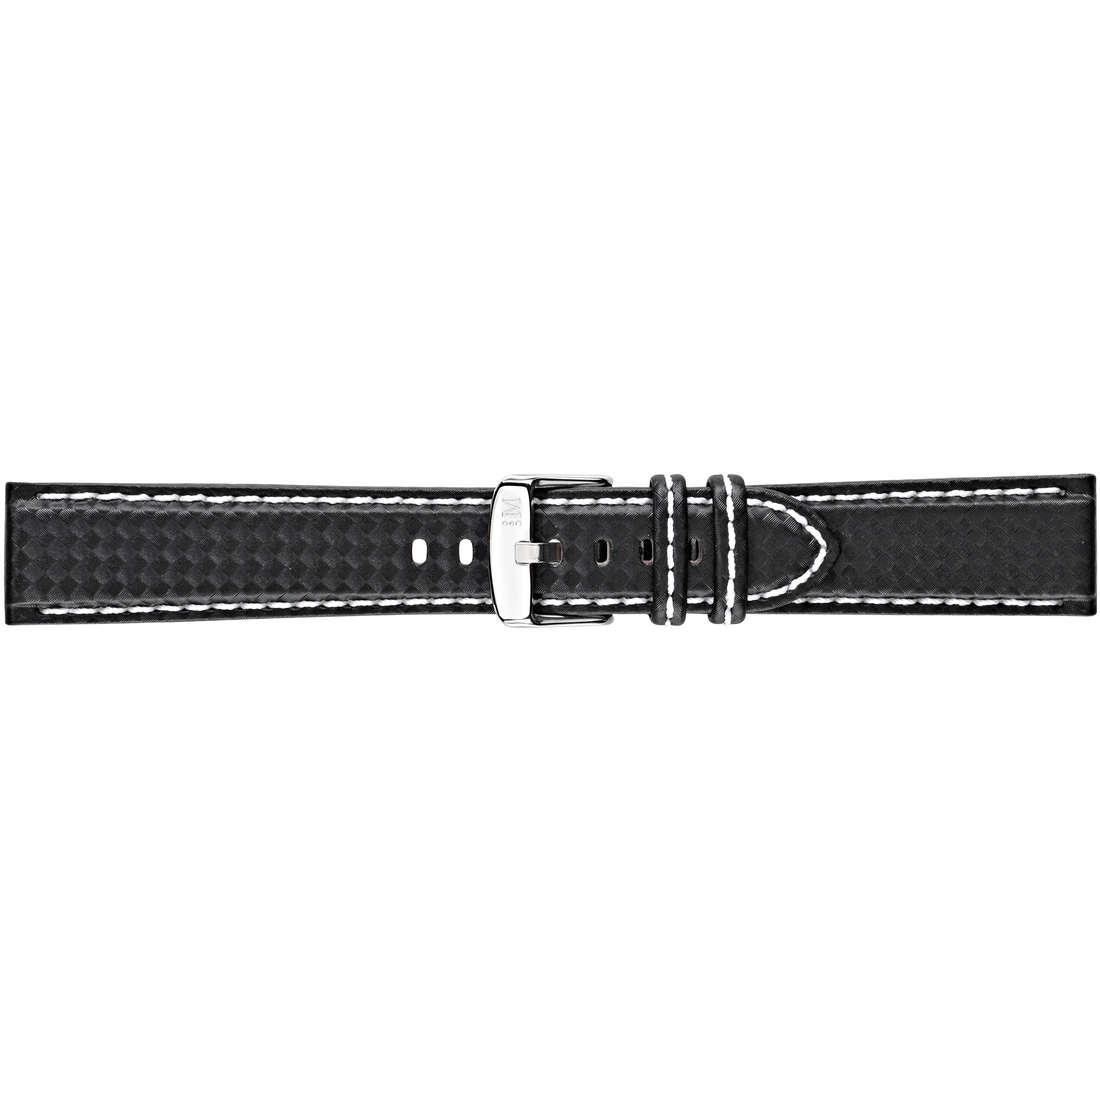 watch watch bands watch straps man Morellato Linea Sport A01U3586977817CR22